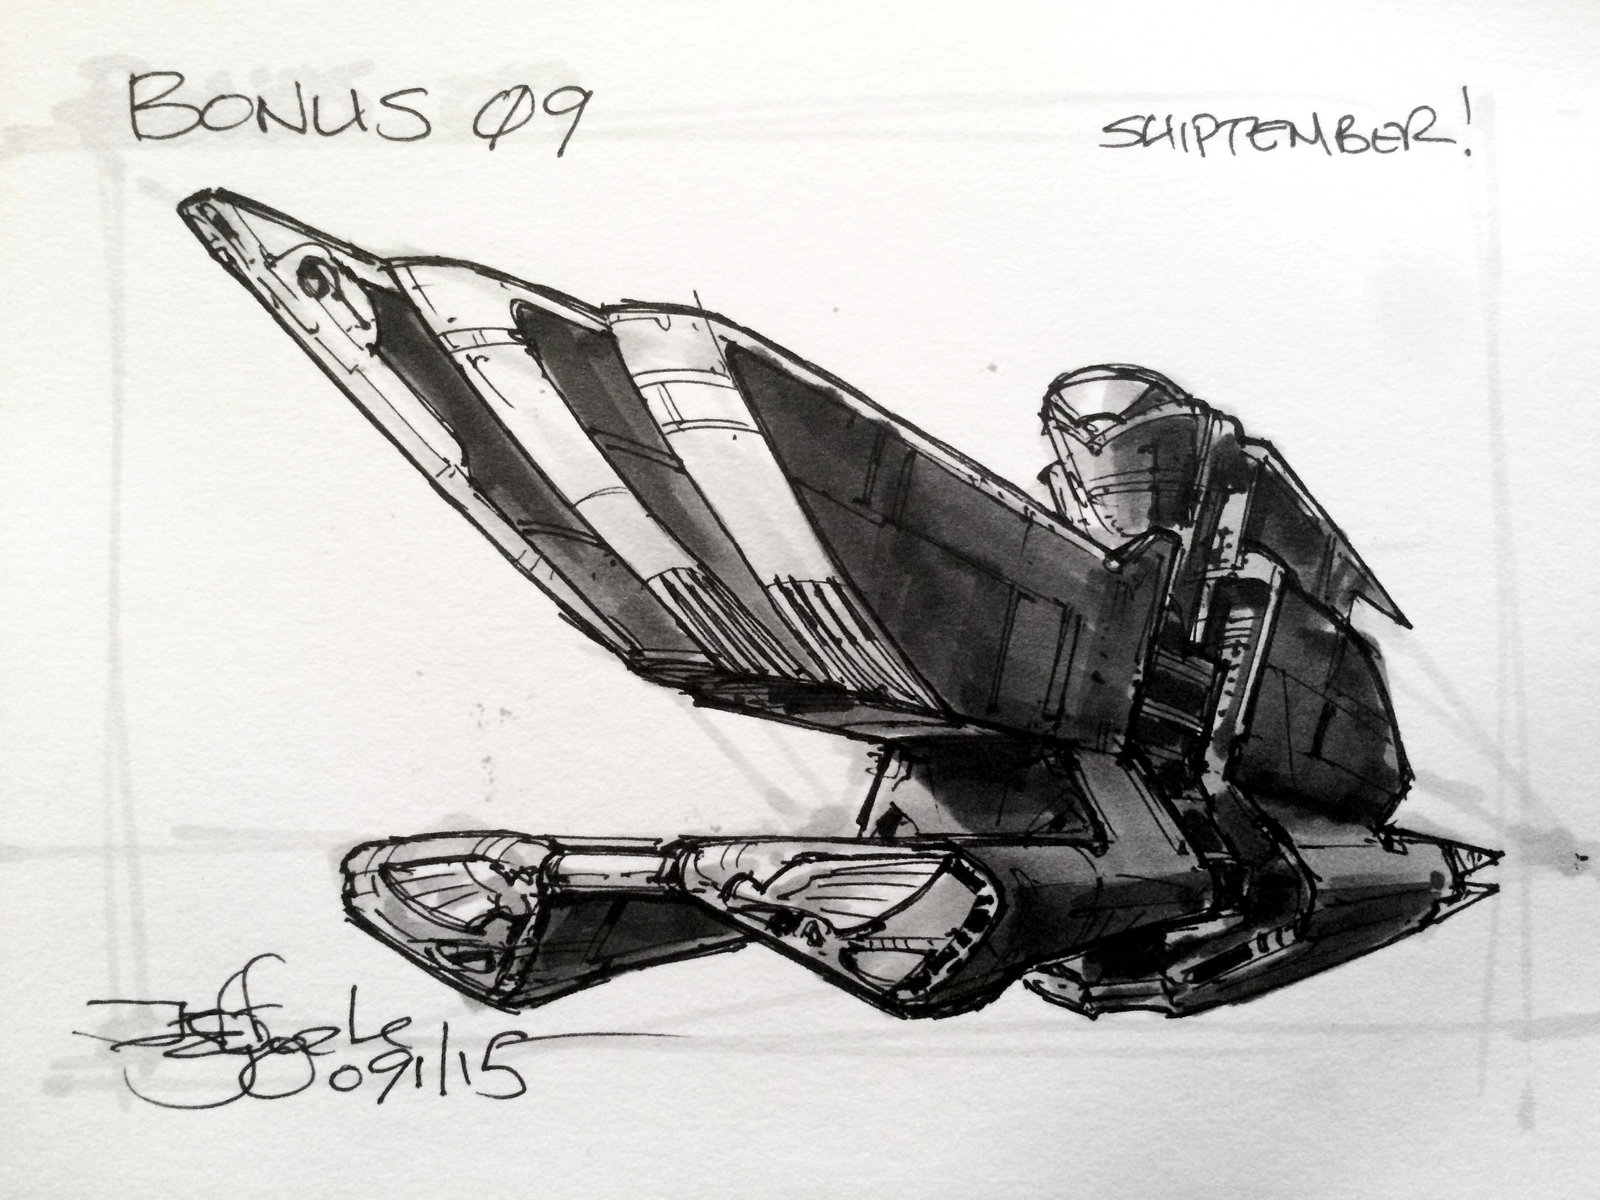 Shiptember Bonus 09